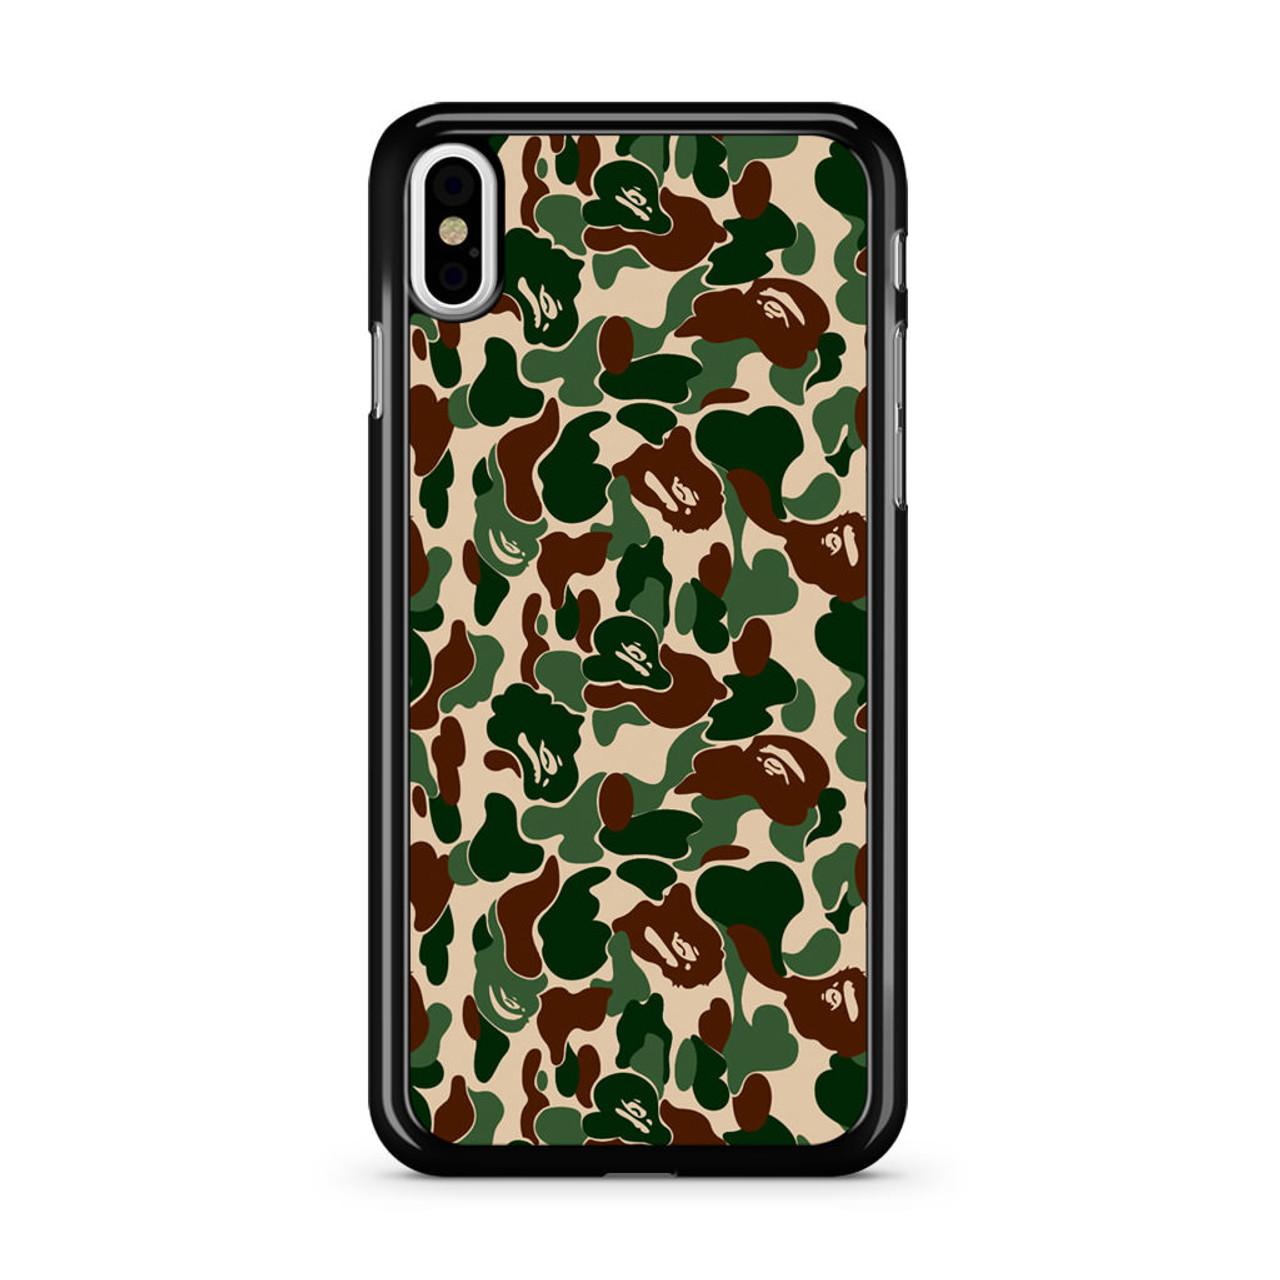 new style 3f145 59bbe Bathing Ape Bape Camo Real Tree iPhone X Case